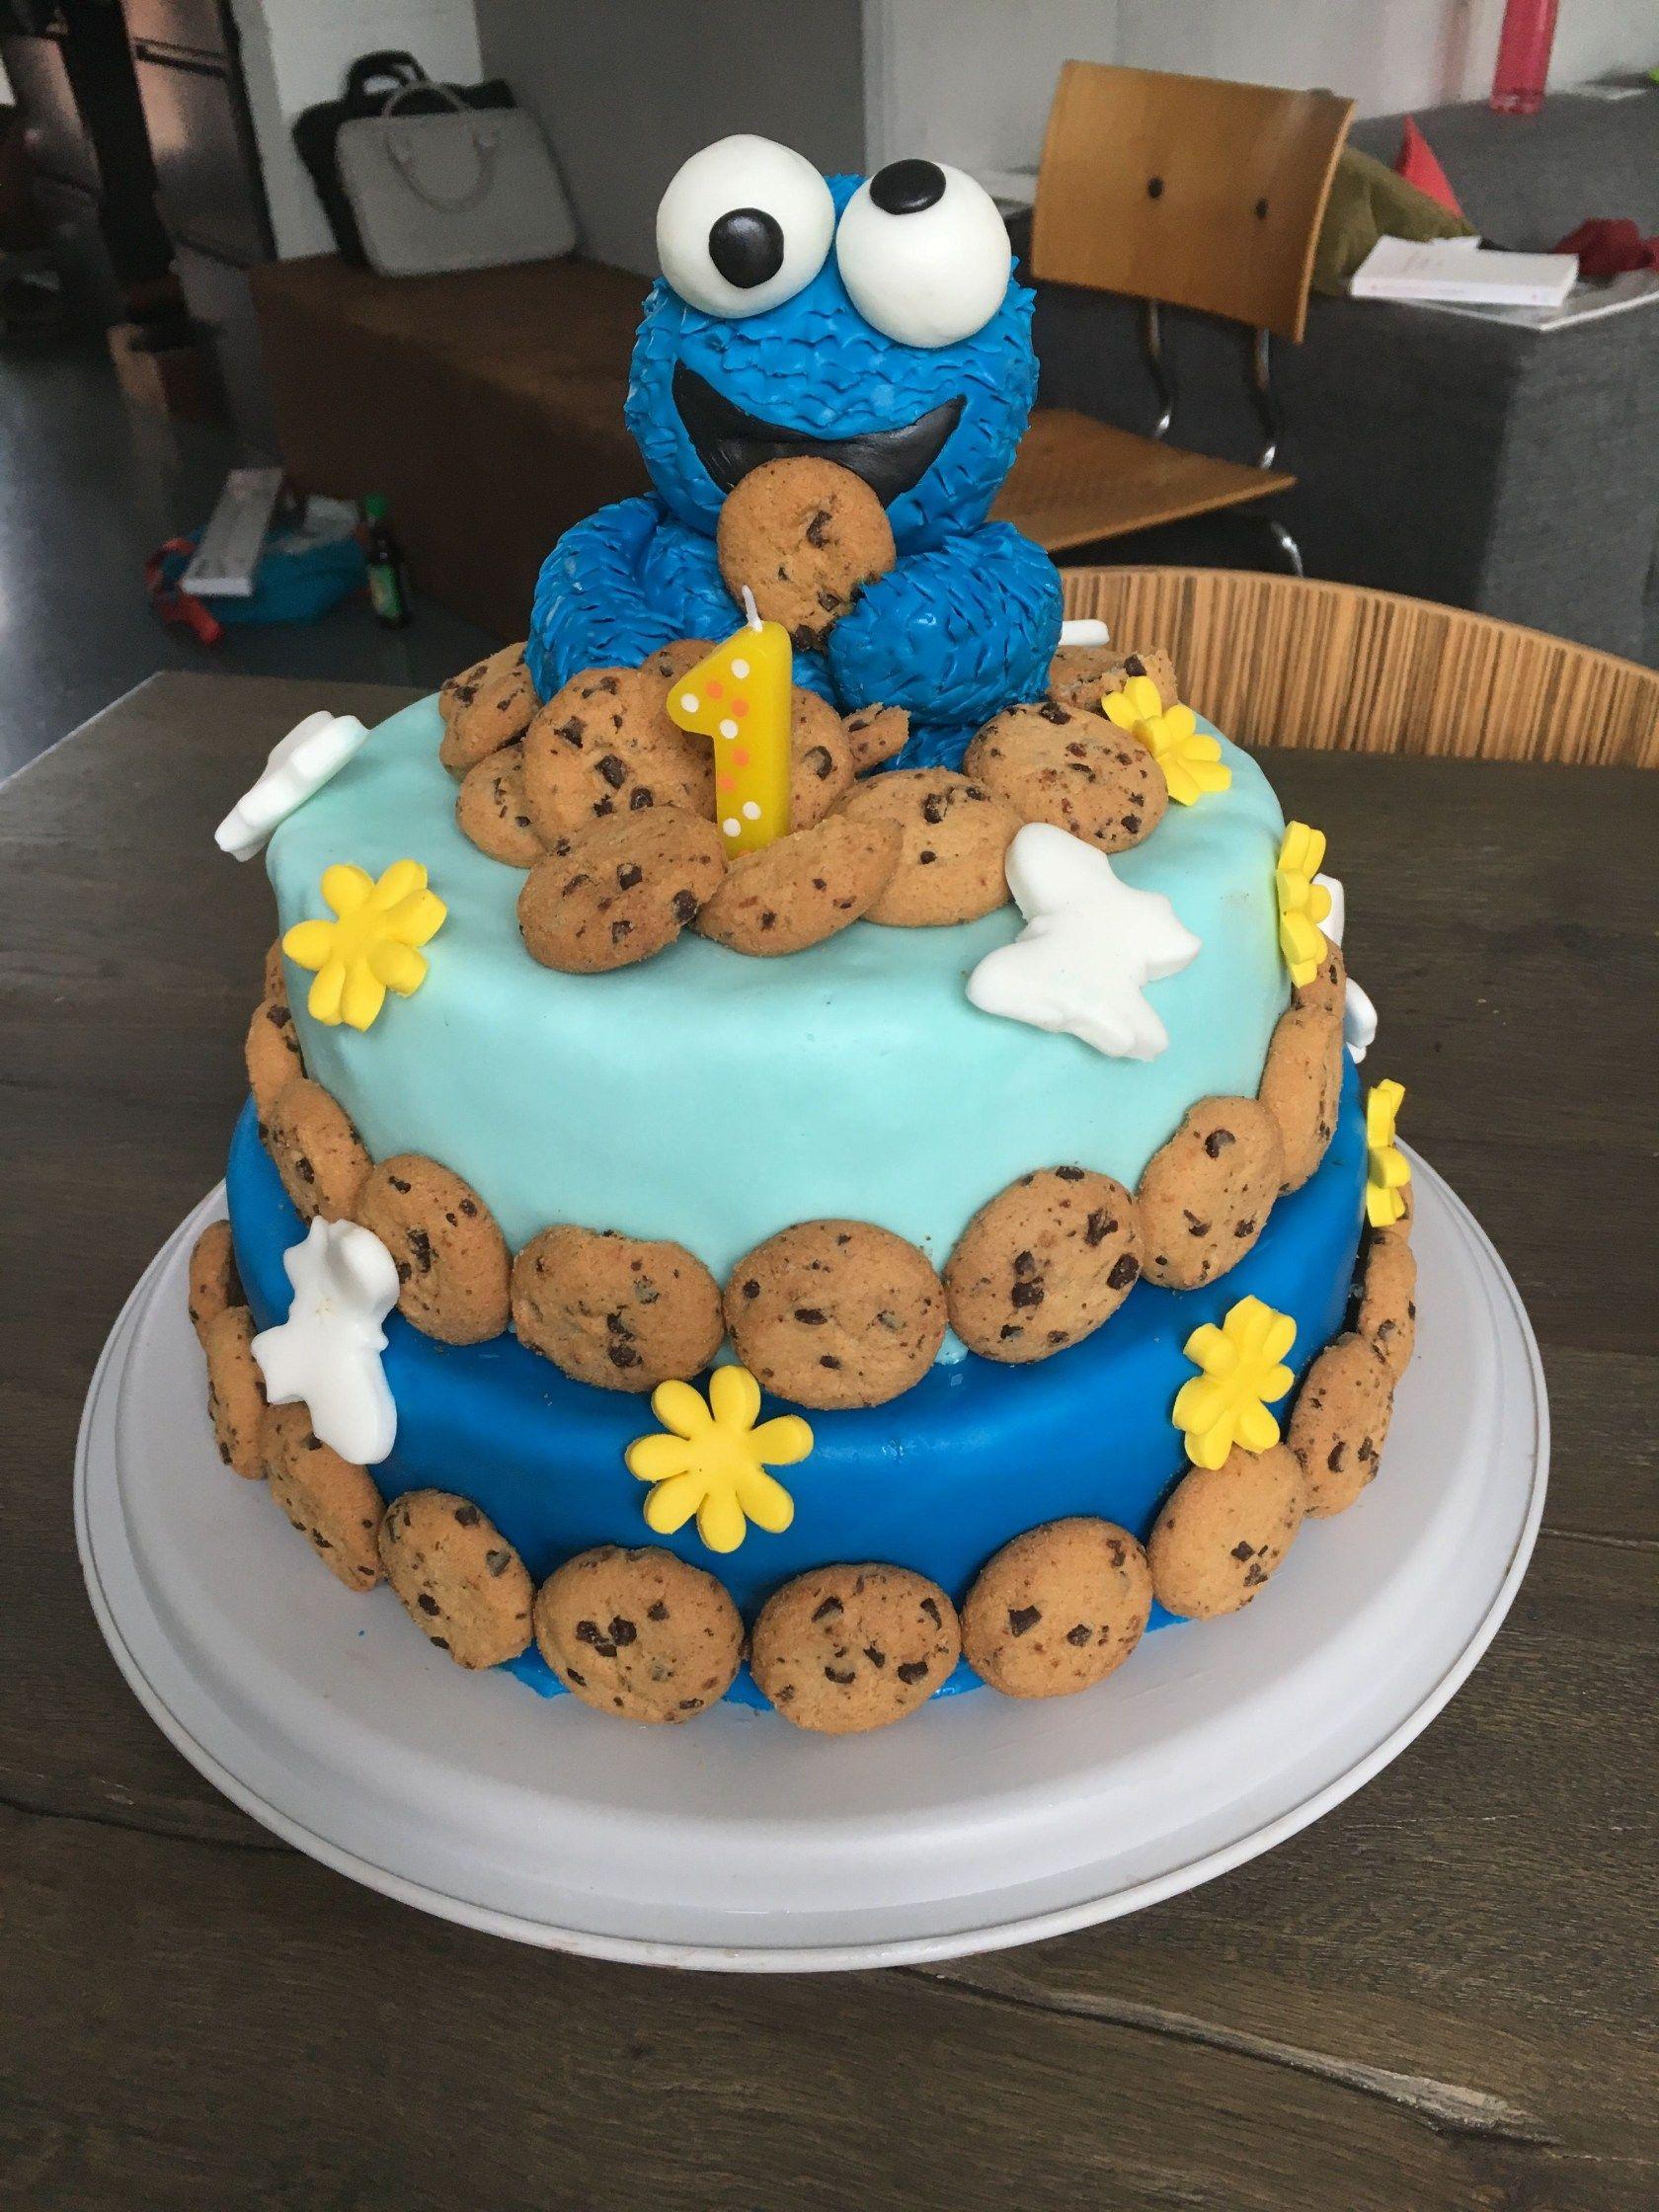 Peachy 1 Year Baby Boy Birthday Cake The Cake Boutique Funny Birthday Cards Online Inifodamsfinfo